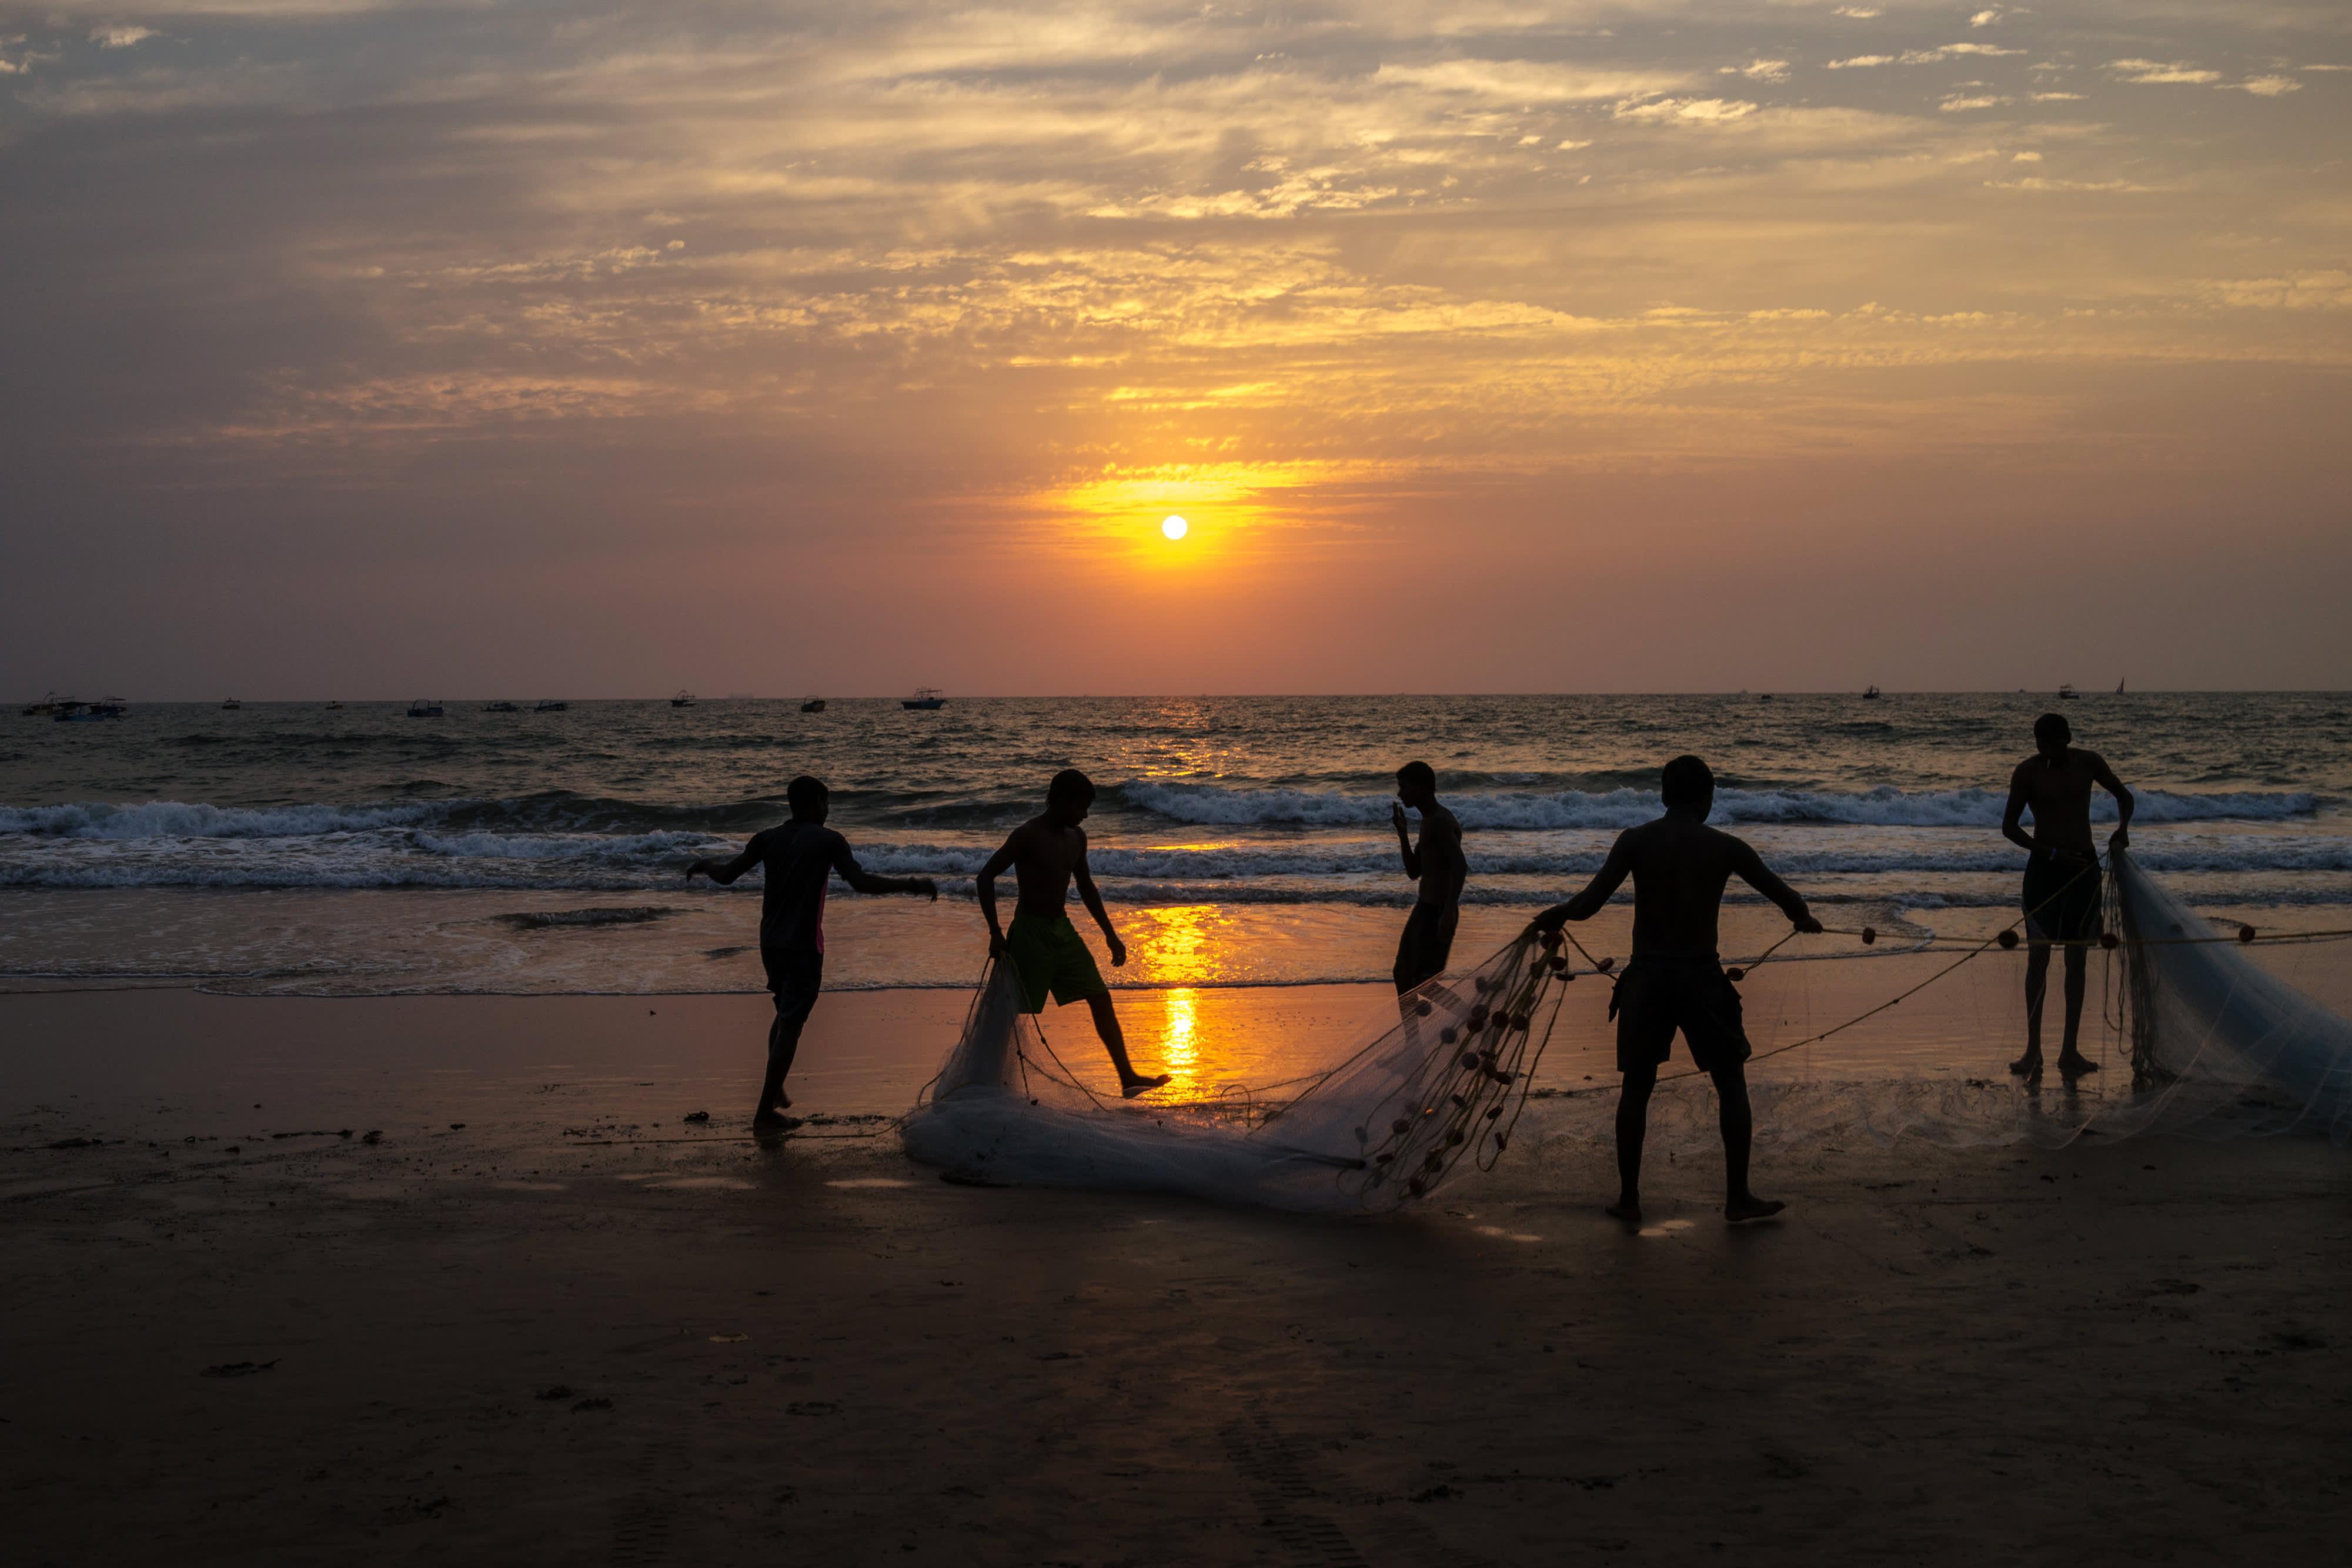 Local fisherman pack a fishing net as the sun sets on Baga beach in Bardez, Goa, India, on Mar. 9, 2016.